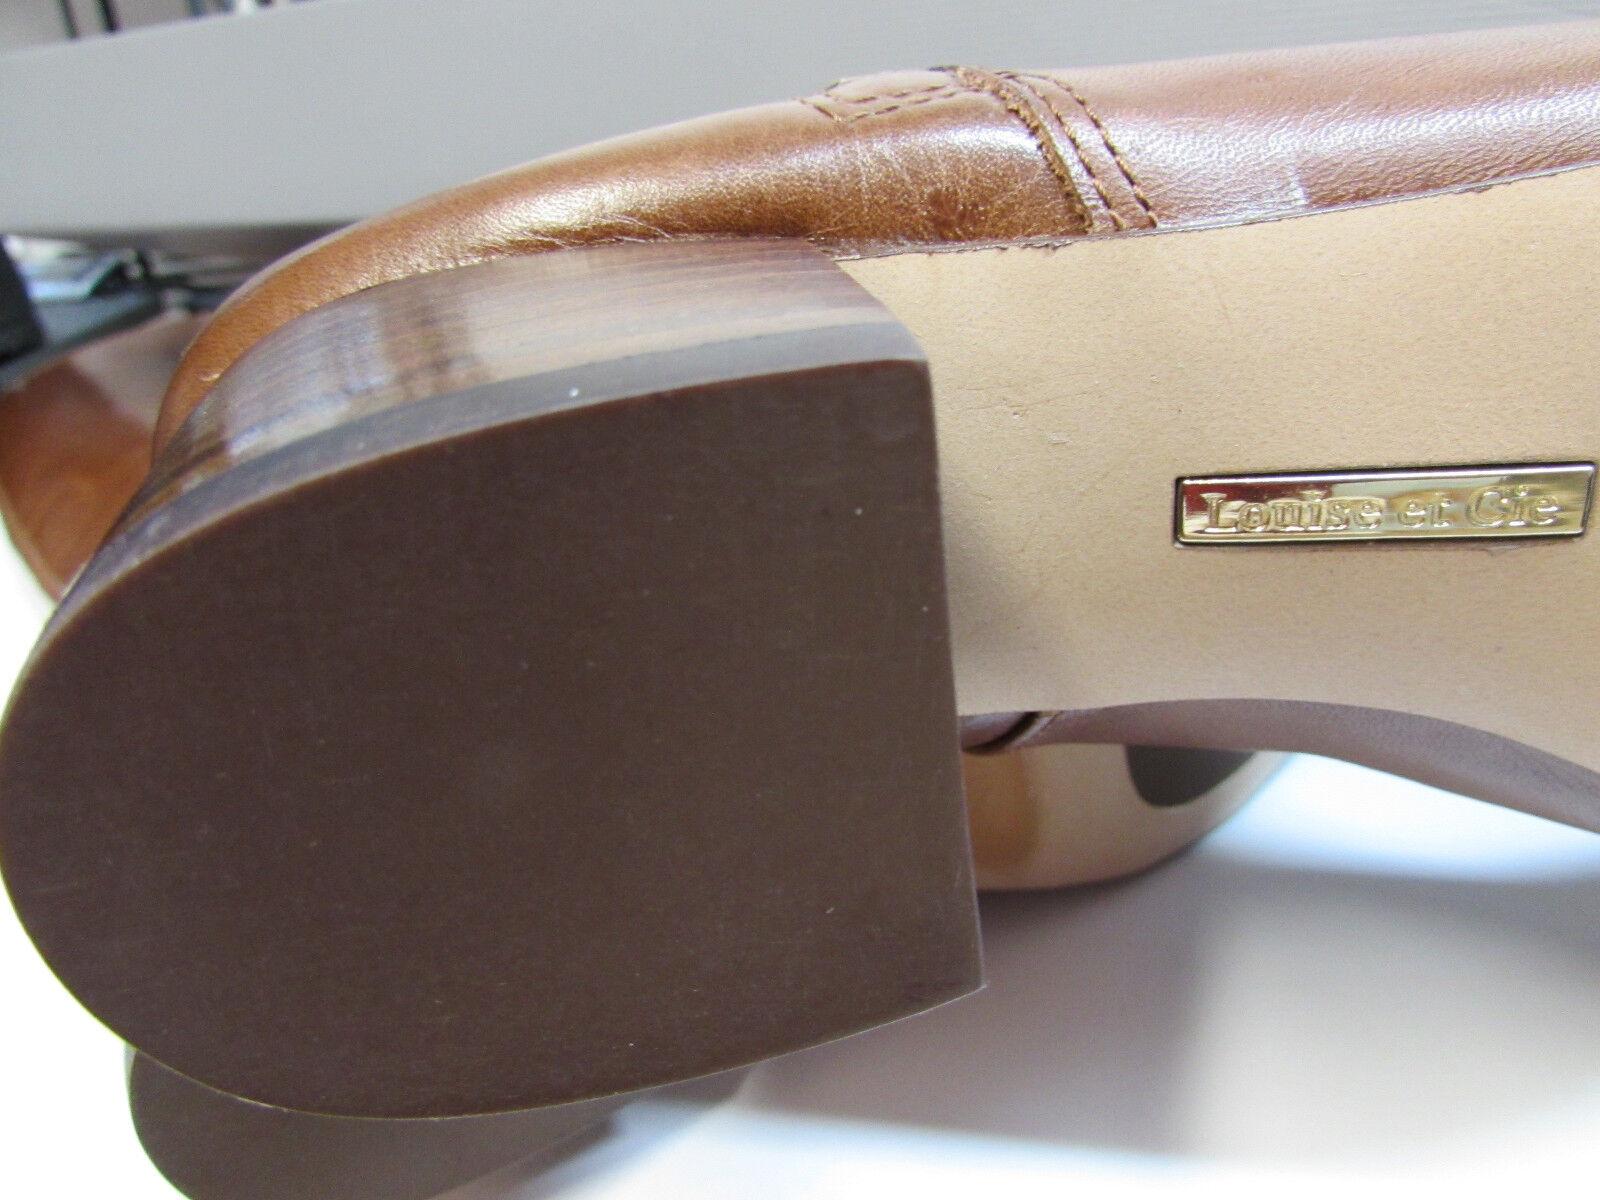 Louise Leder et Cie Größe 7.5 M Whiskey Tan Leder Louise Stiefel New Damenschuhe Schuhes b538f9